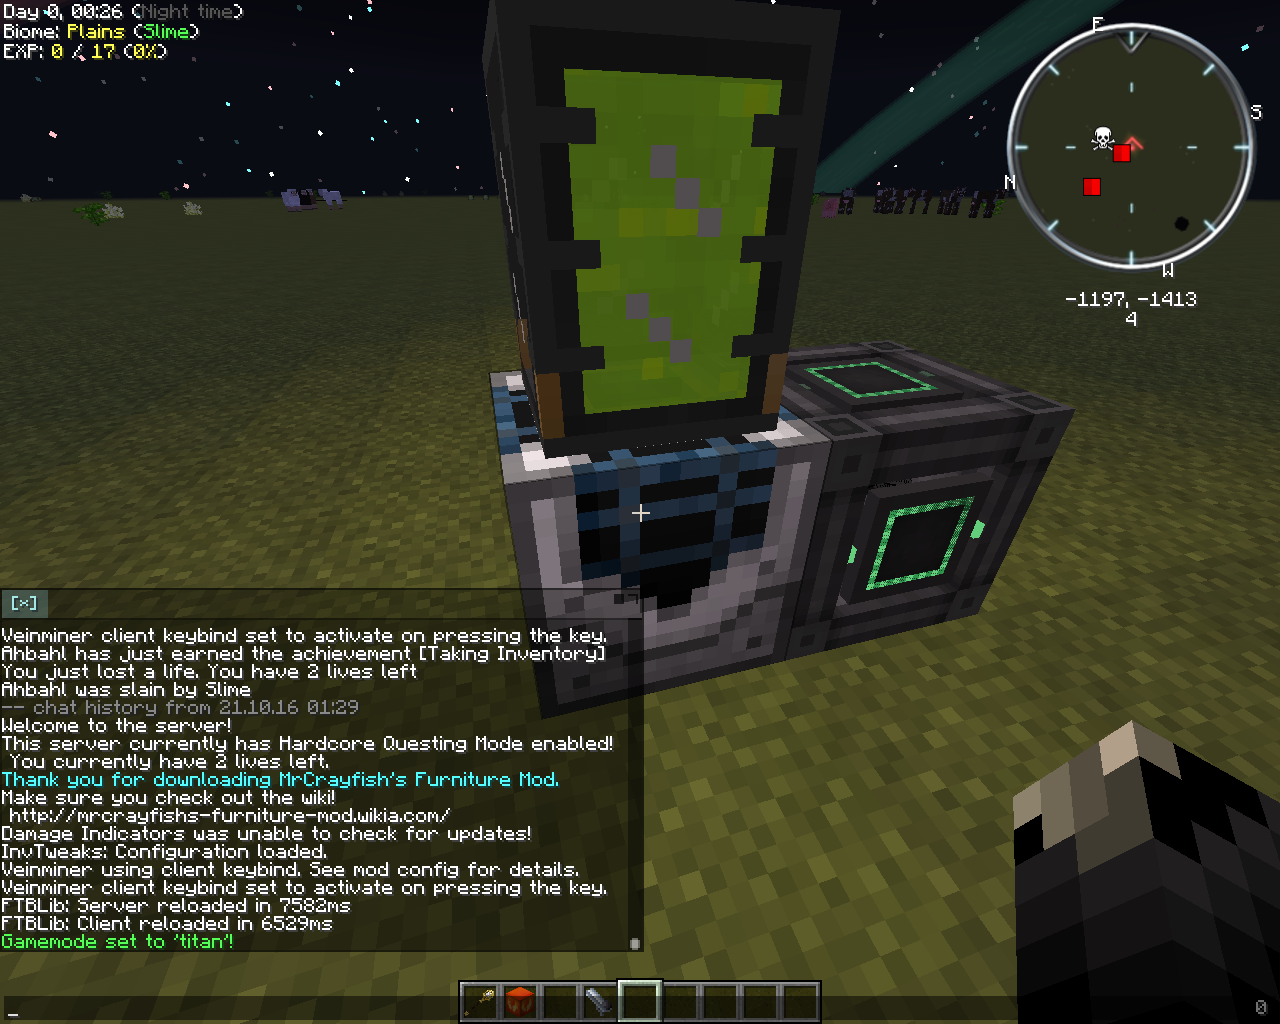 Done - [Titan] Auto-Spawner doesnt spawn animated blocks